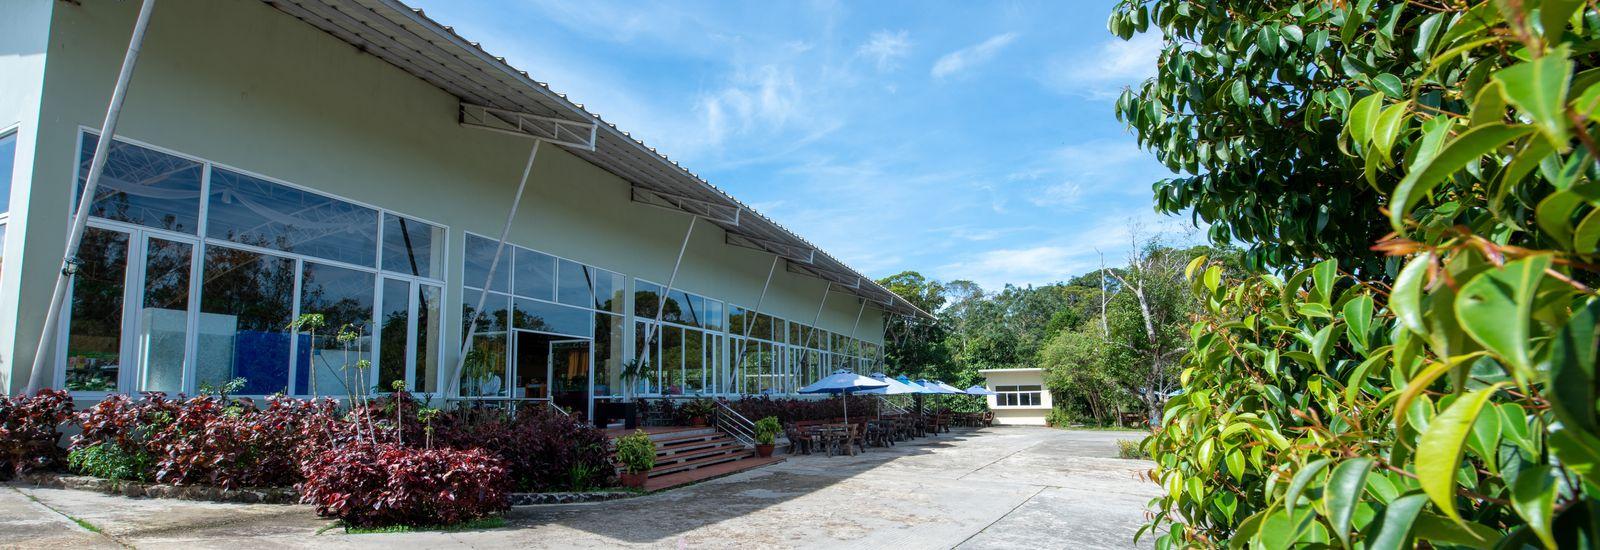 WaterFall Restaurant Outdoor